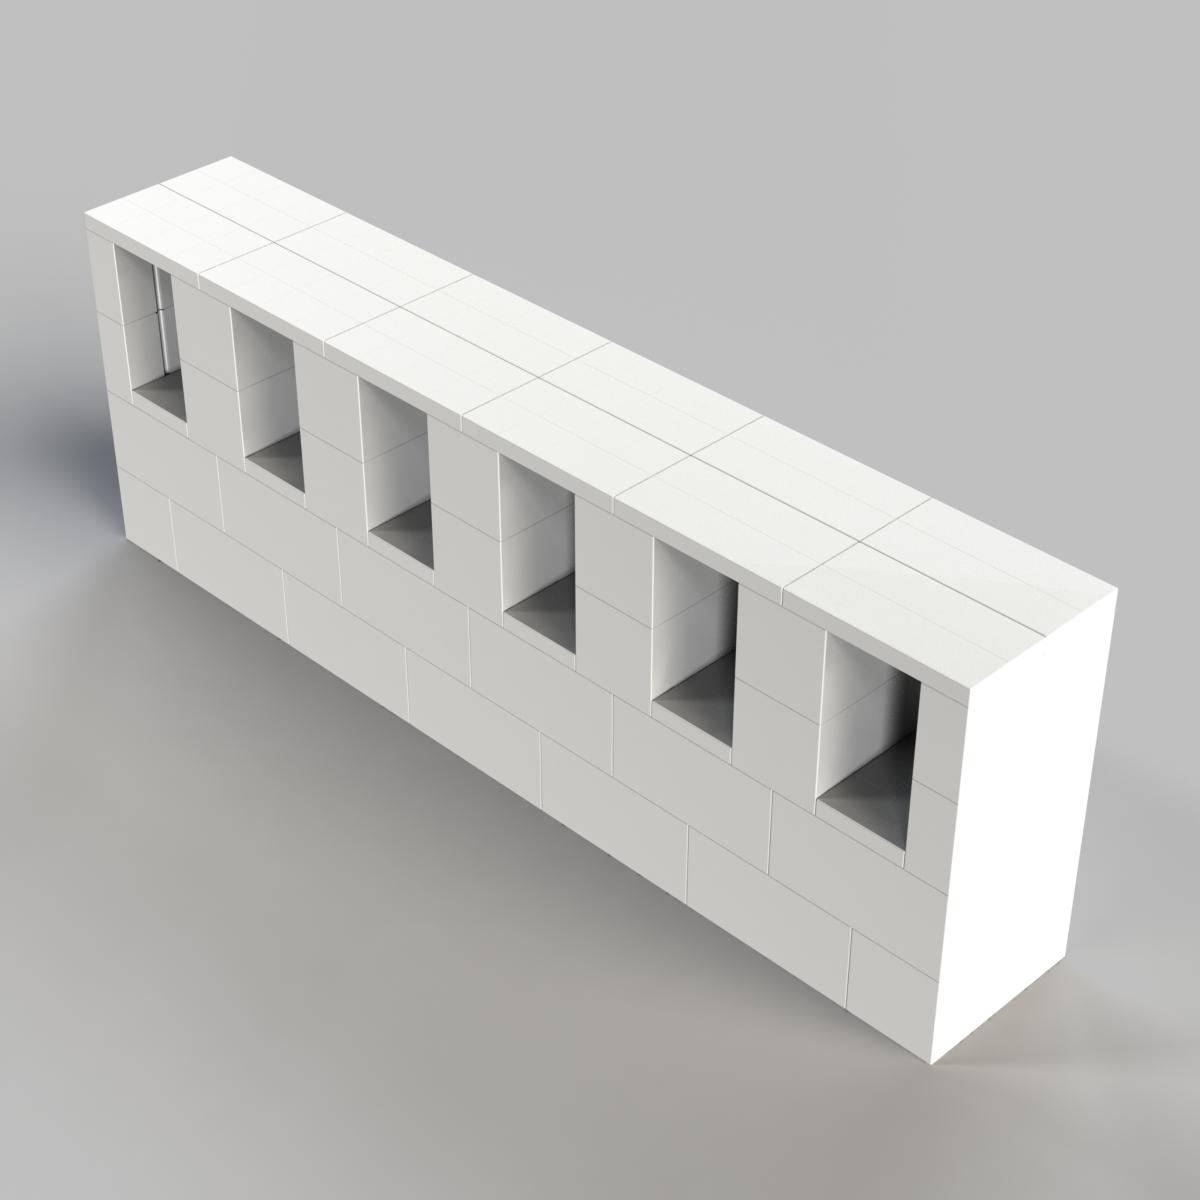 6ft Consol / TV Shelf